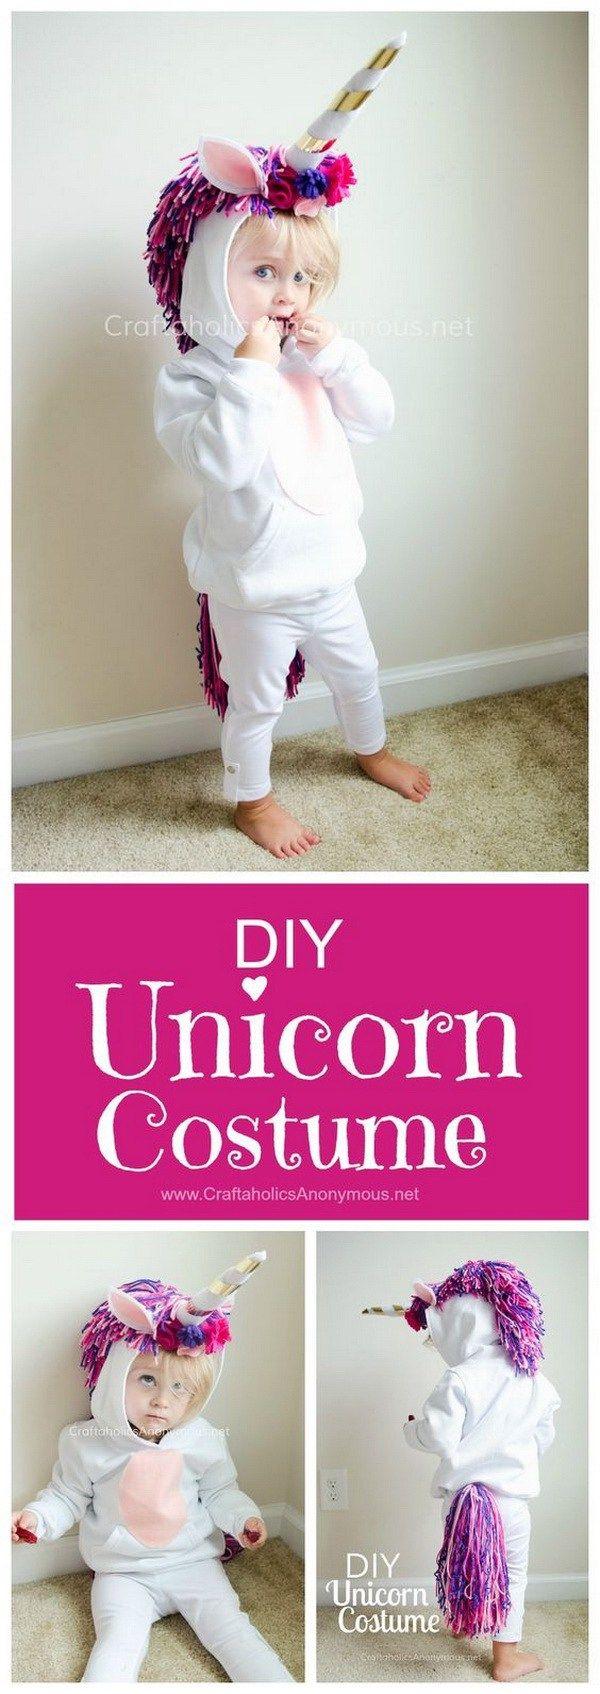 DIY Unicorn Costume for Kids.                                                                                                                                                                                 More